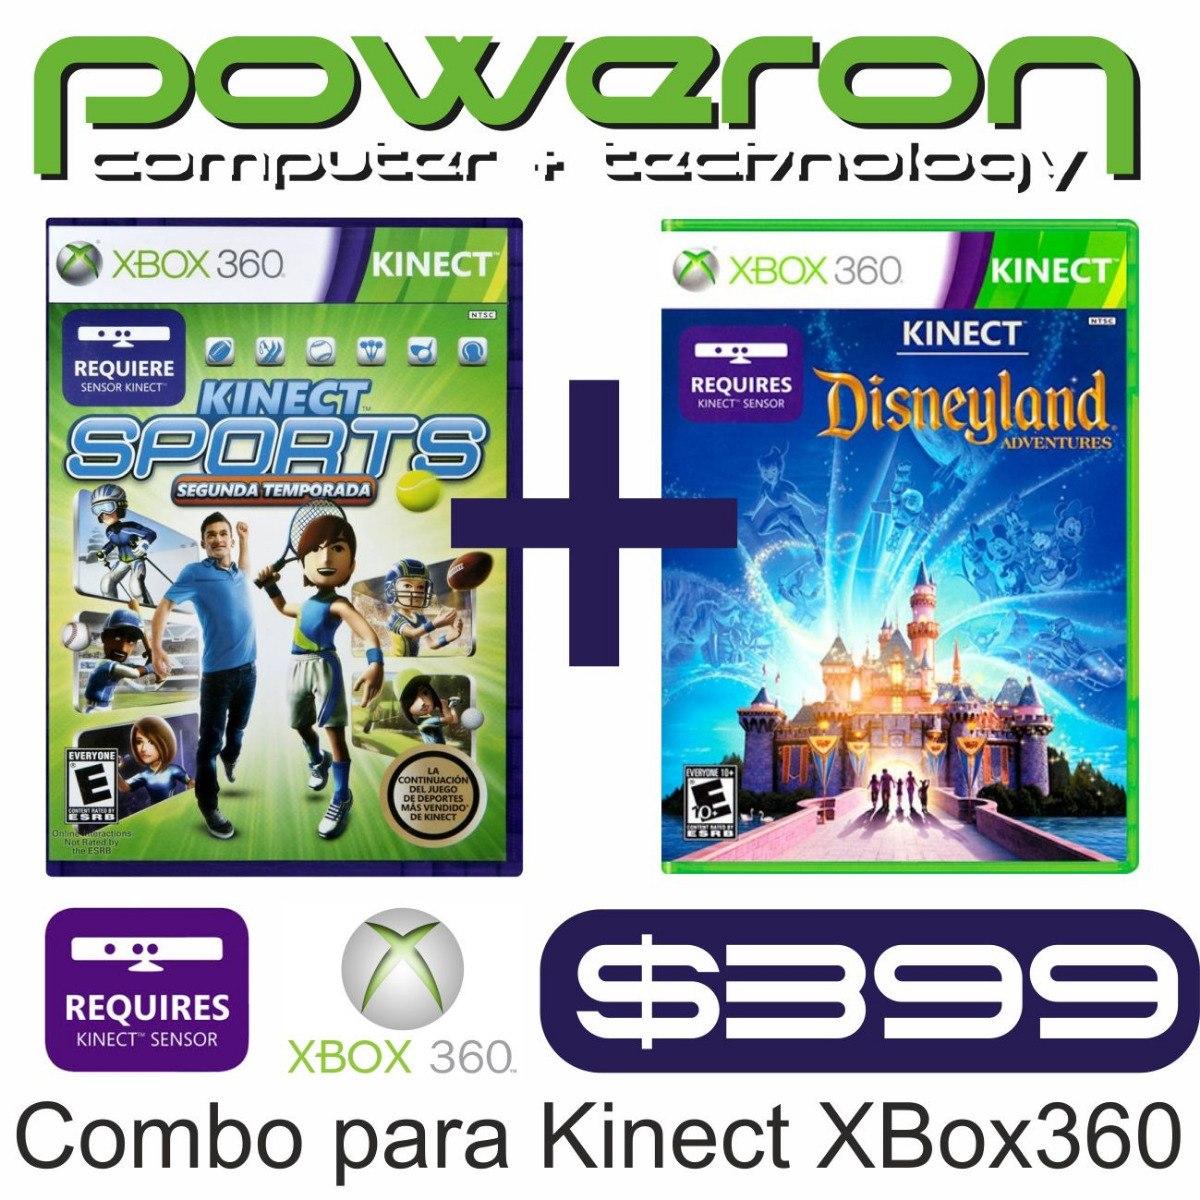 Juegos De Xbox 360 Original Kinect Combo Sports Disneyland 399